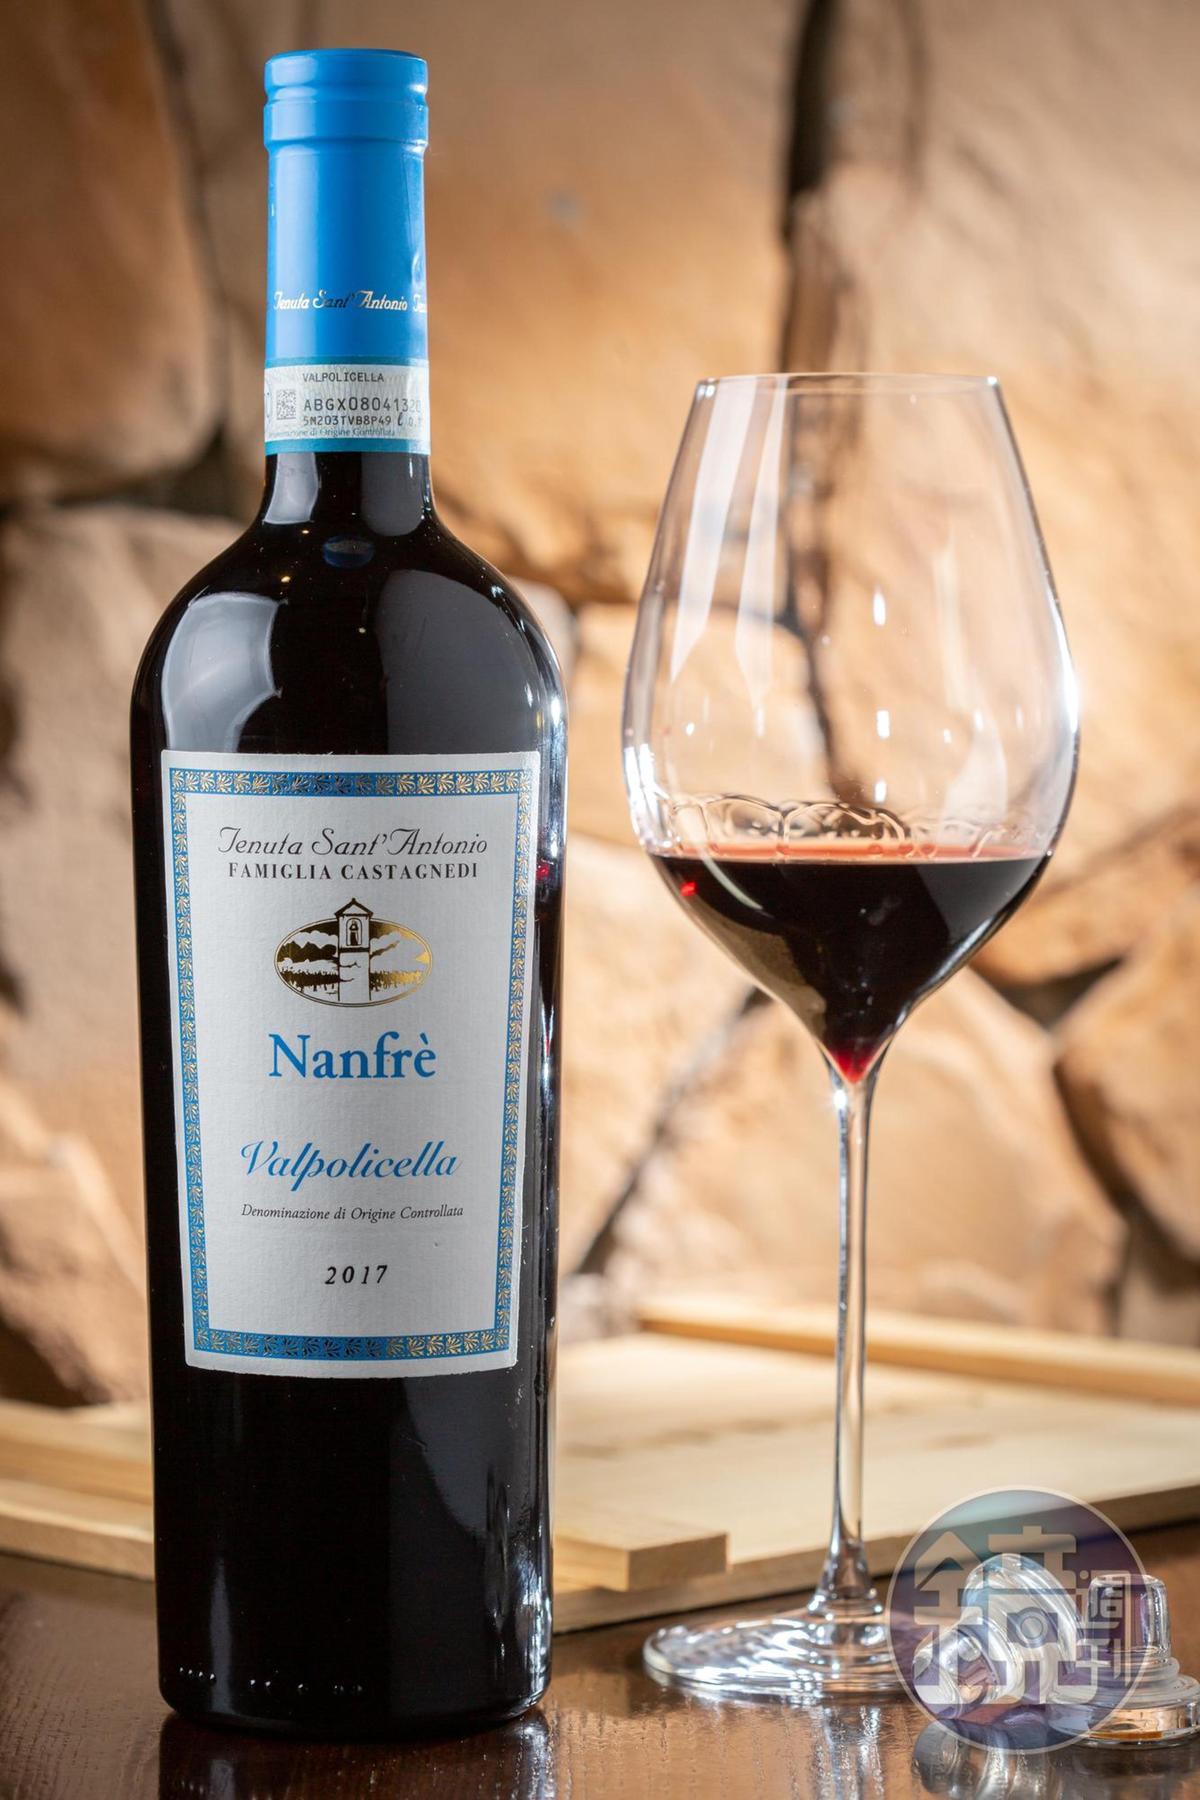 「NANFRÈ Valpolicella DOC」與Amarone同樣以Corvina葡萄為主原料,卻因縮短釀期,展現清新奔放的花香和椒果香。(4,500元/6瓶、箱)